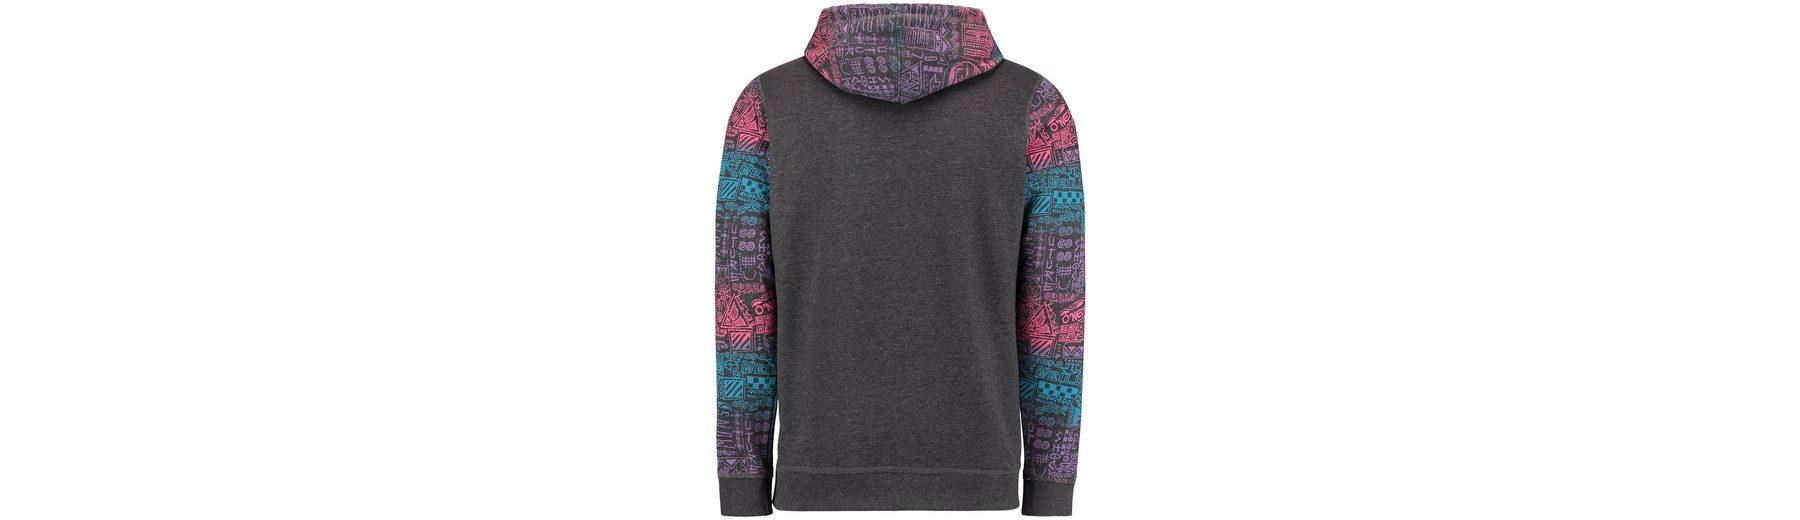 O'Neill Kapuzensweatshirt Heritage Printed Billig Verkauf Beste Preise Auslass Verkauf TOmYR9UEv